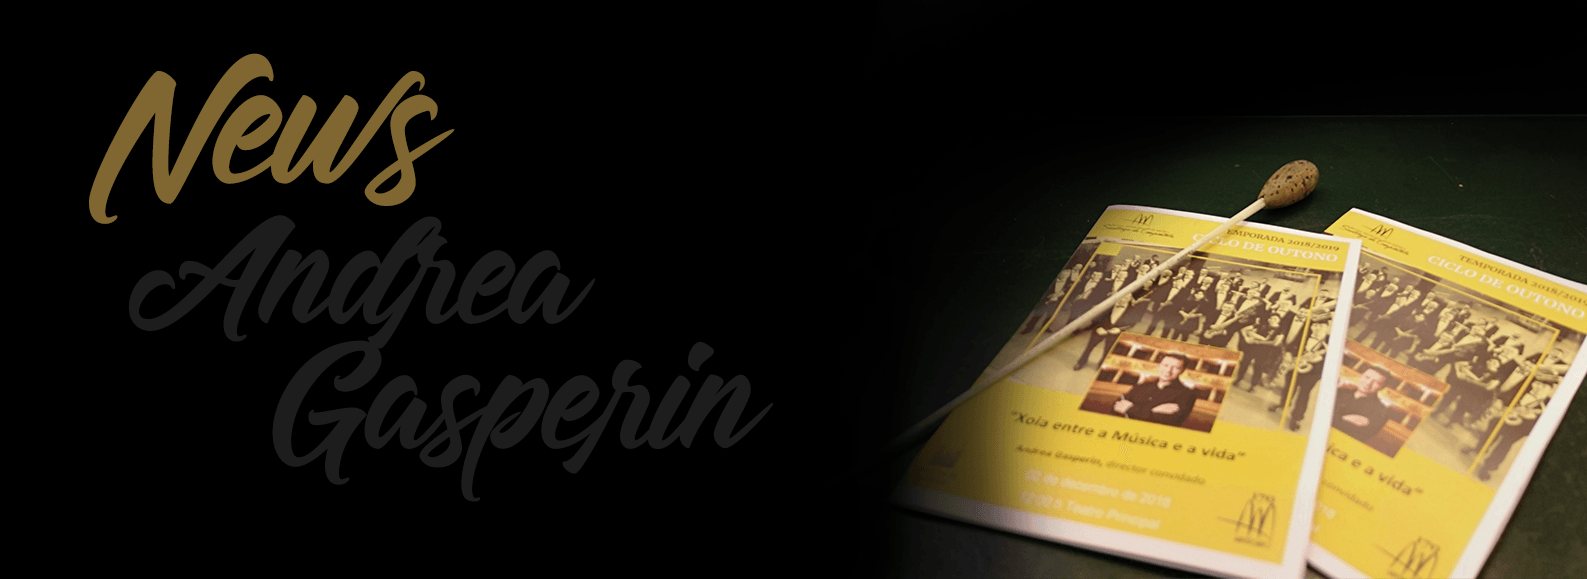 Andrea Gasperin - News